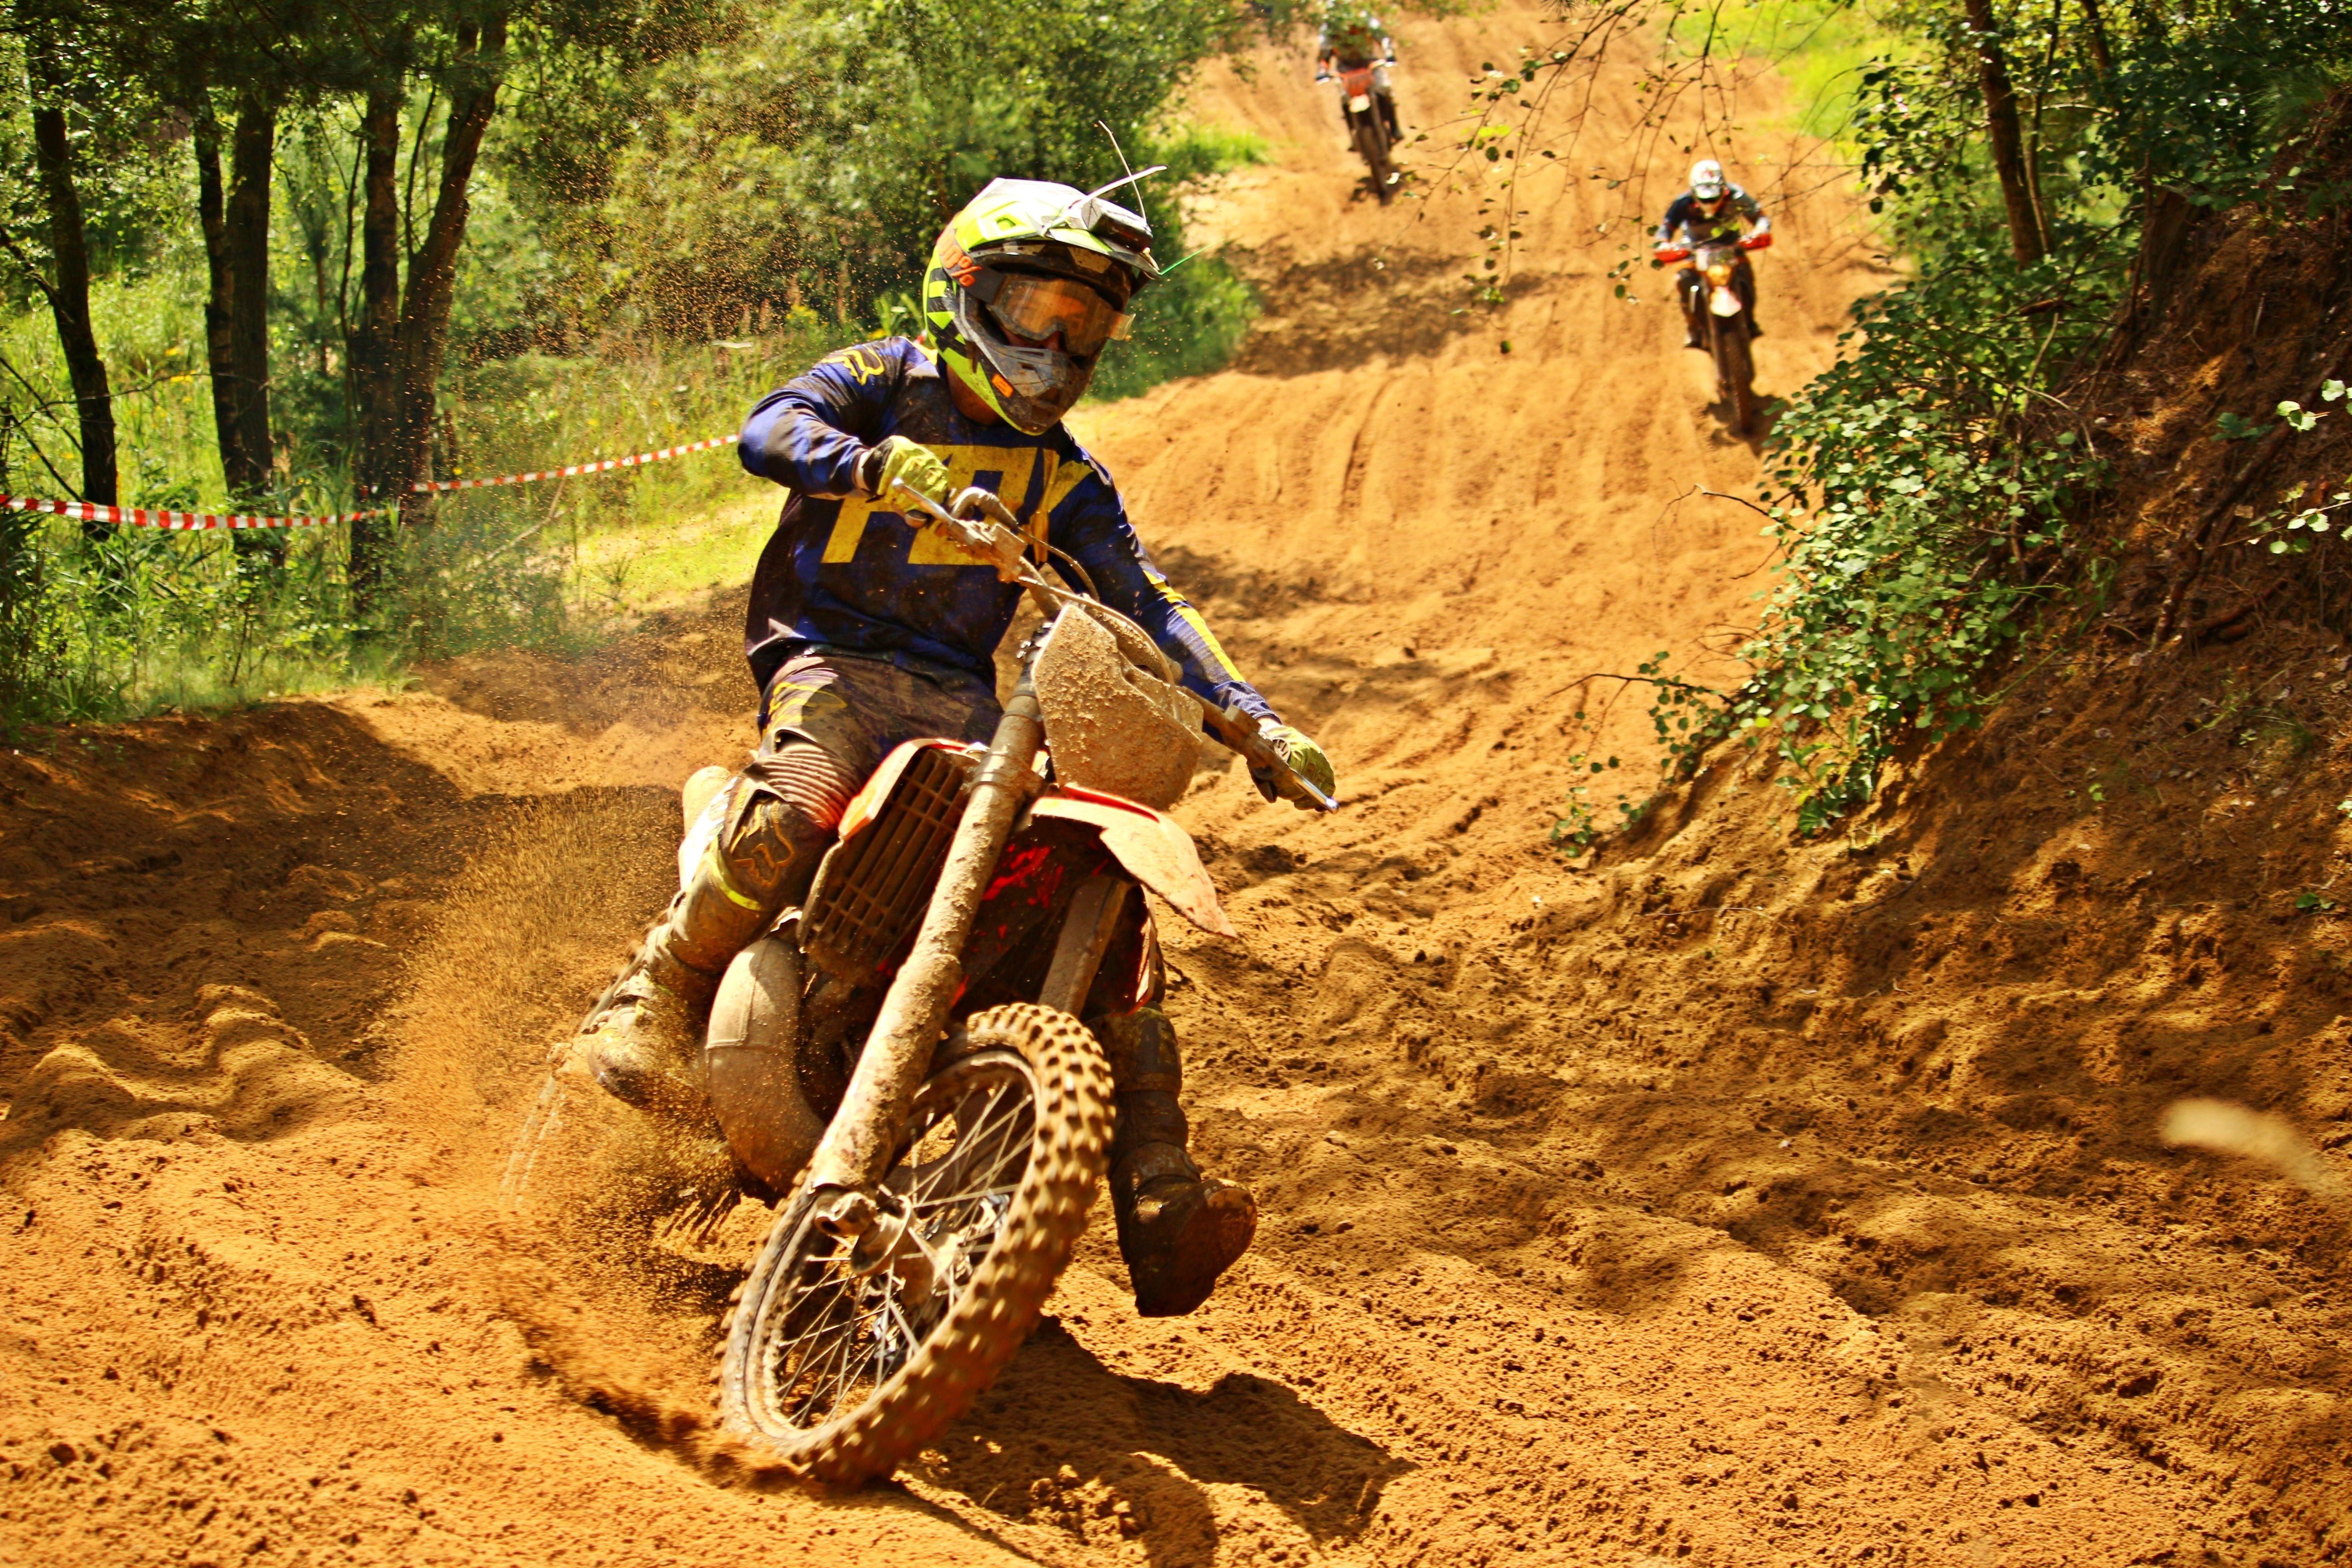 Motocross Enduro Ride Motocross Ride Motorcycle Sport Sand